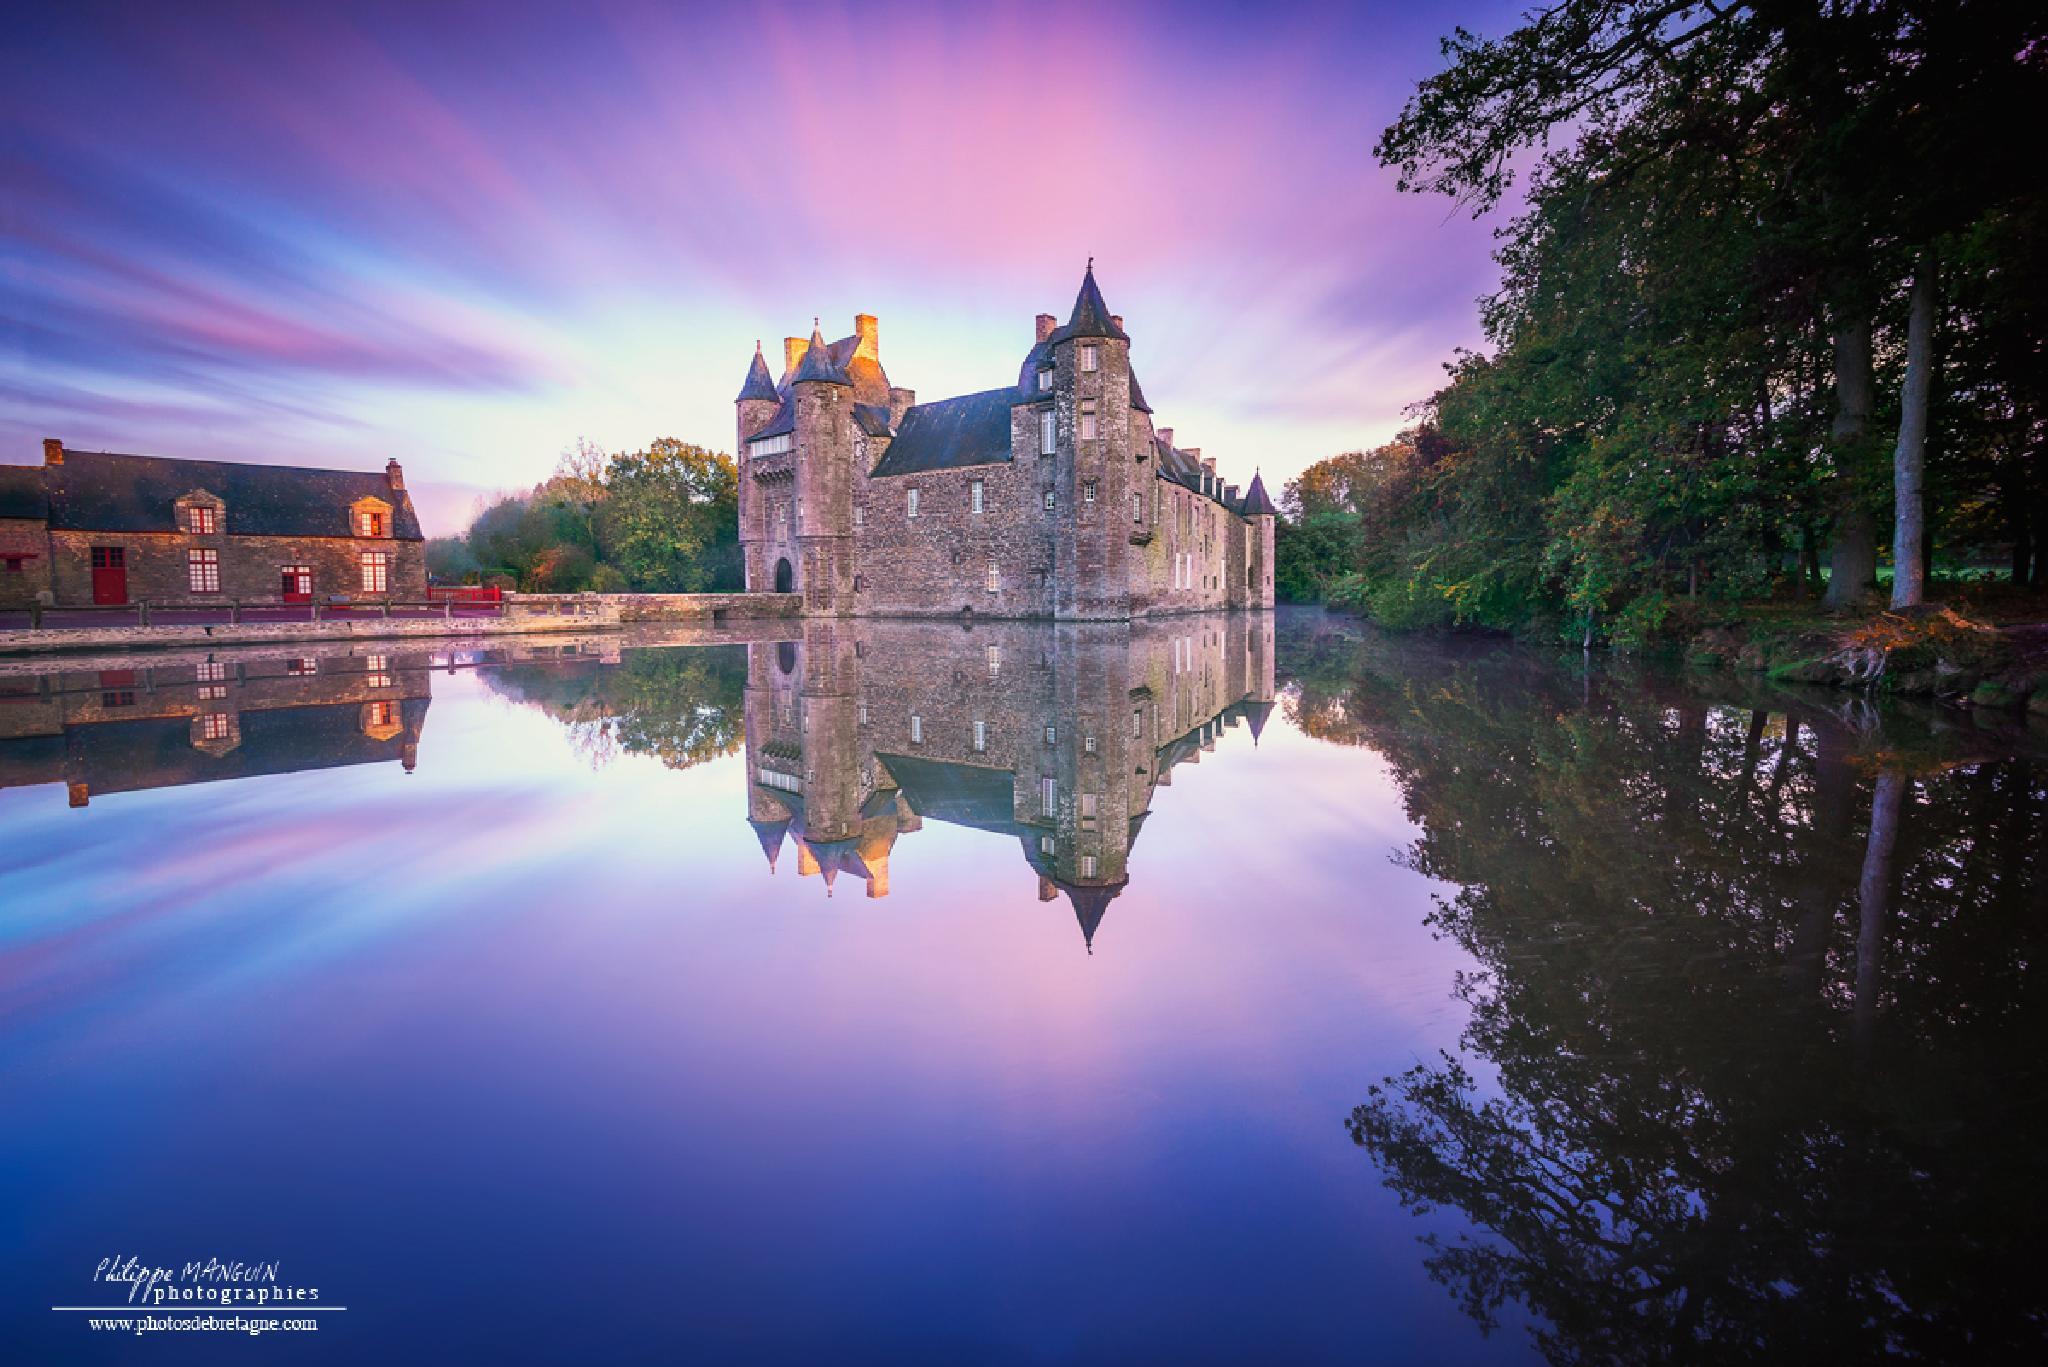 Trecesson castle by PhilippeMANGUIN